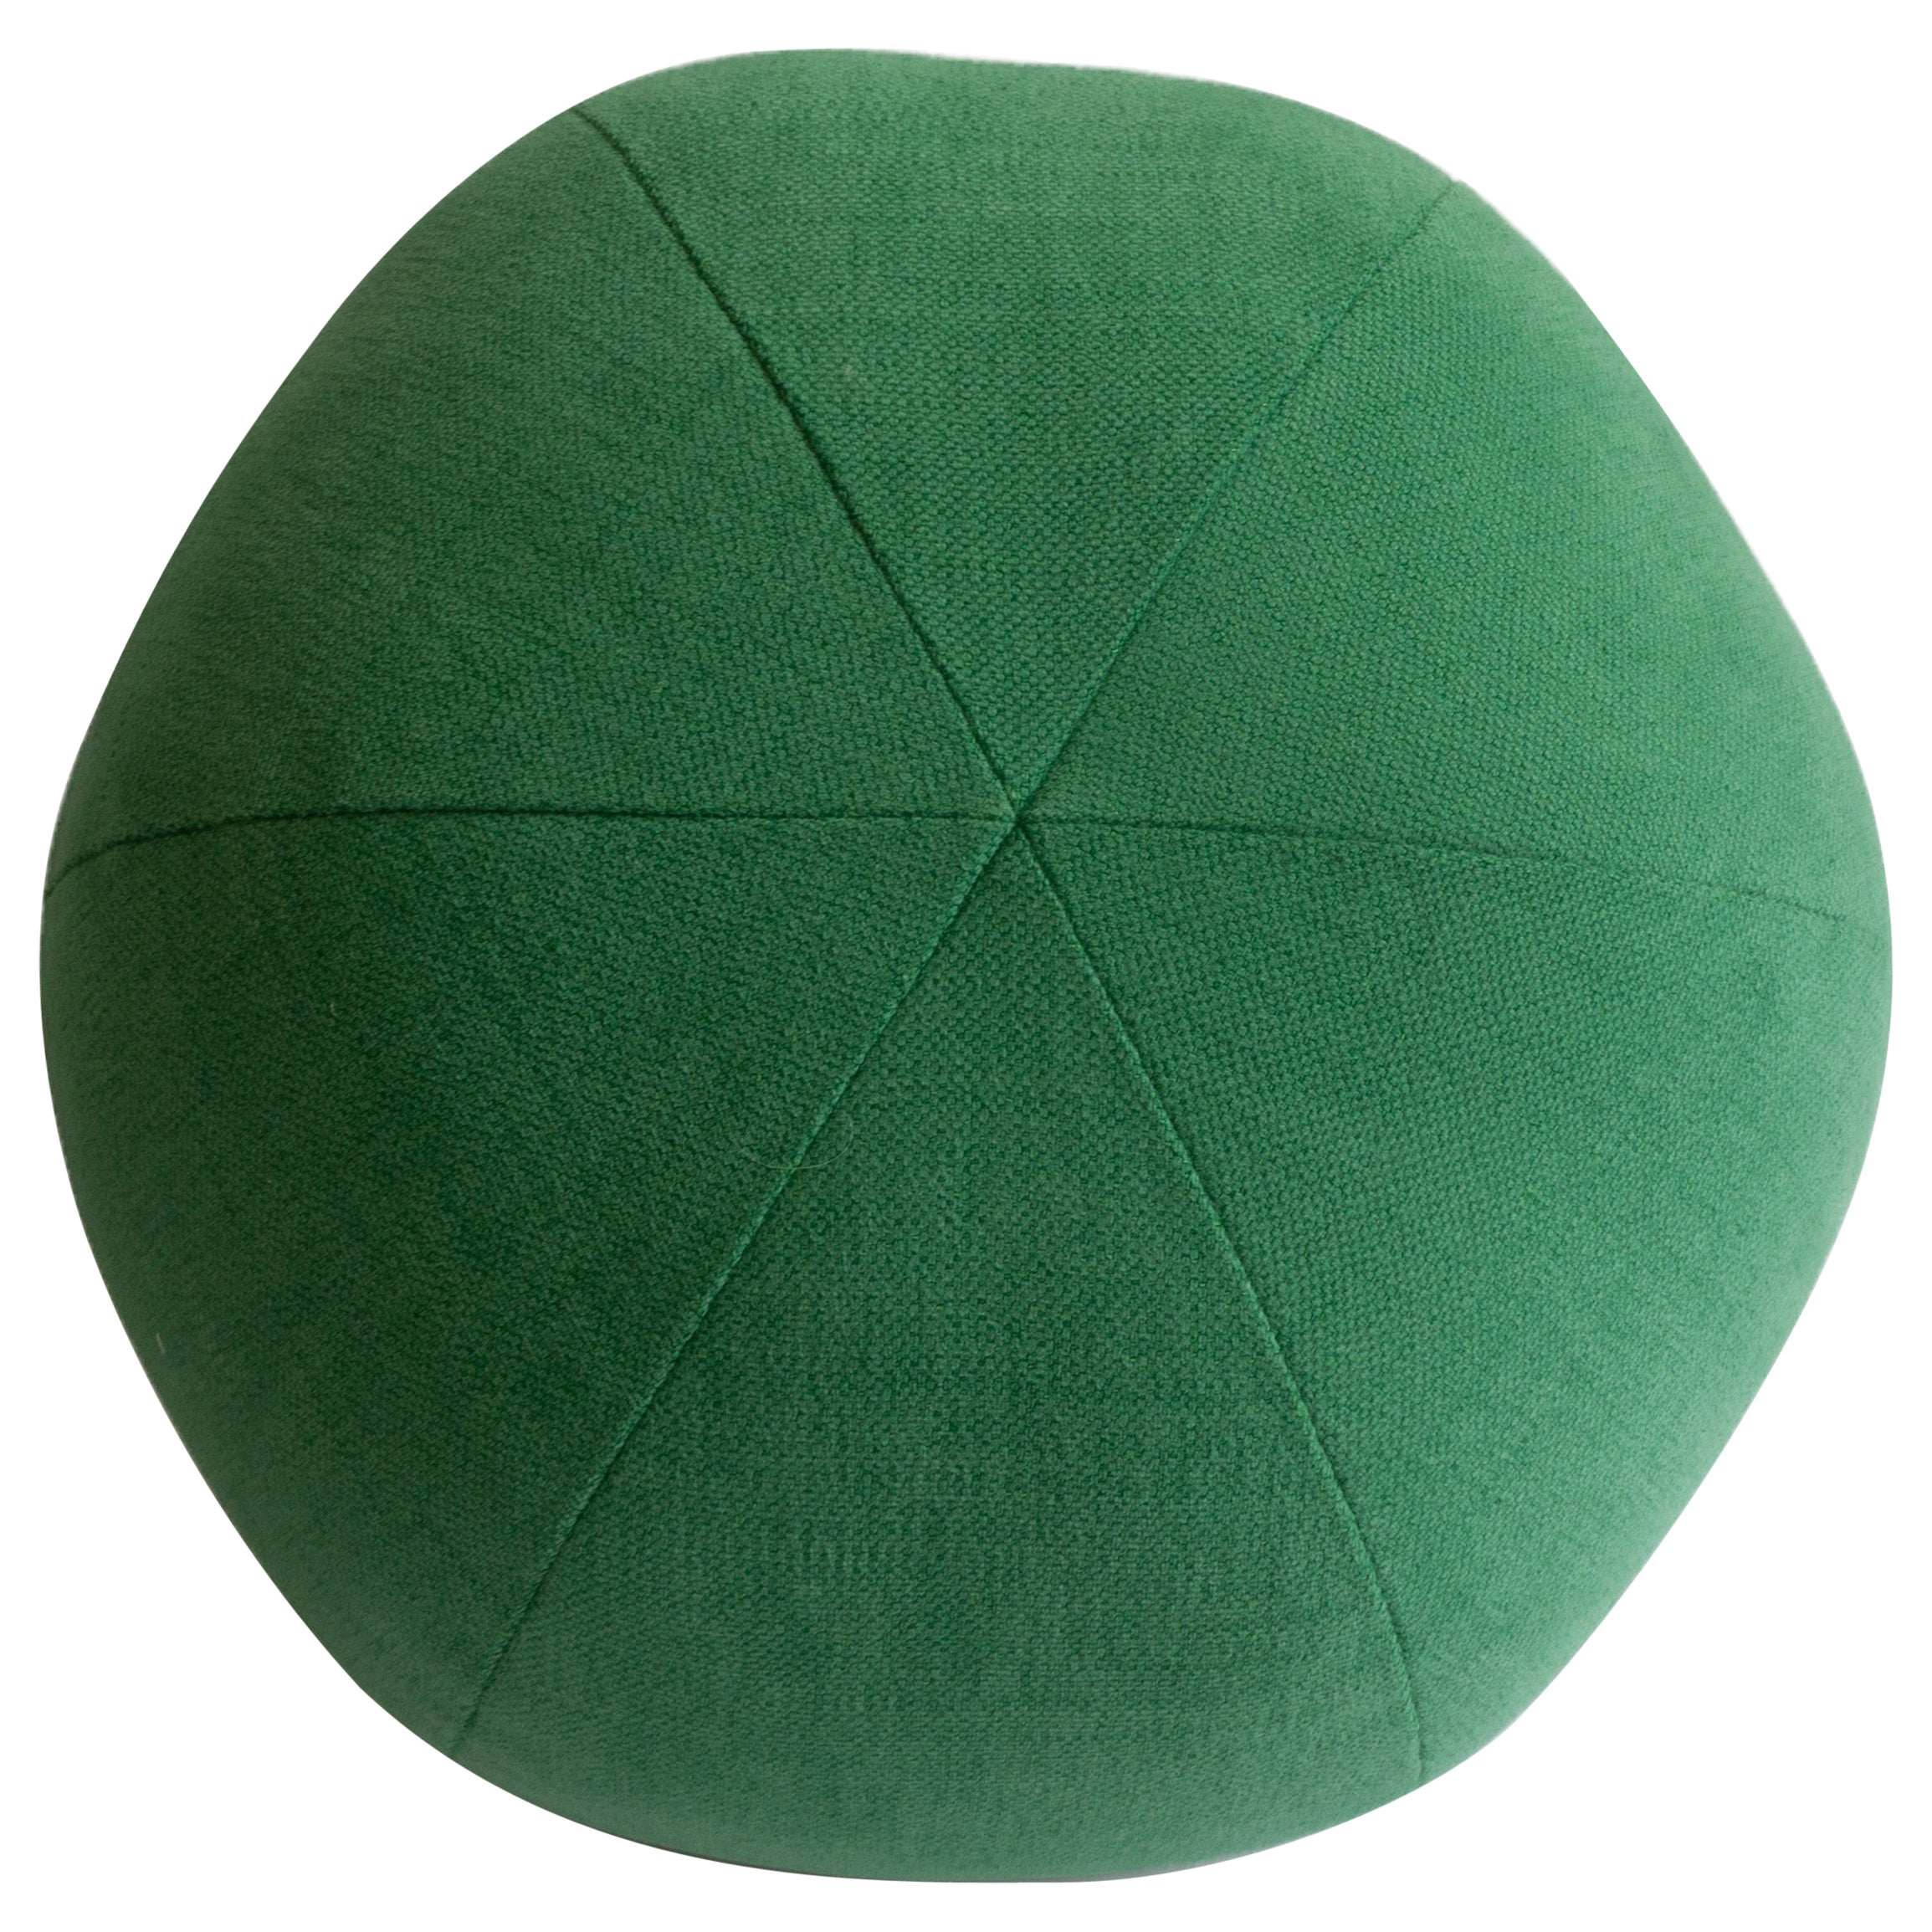 Green Round Ball Throw Pillow